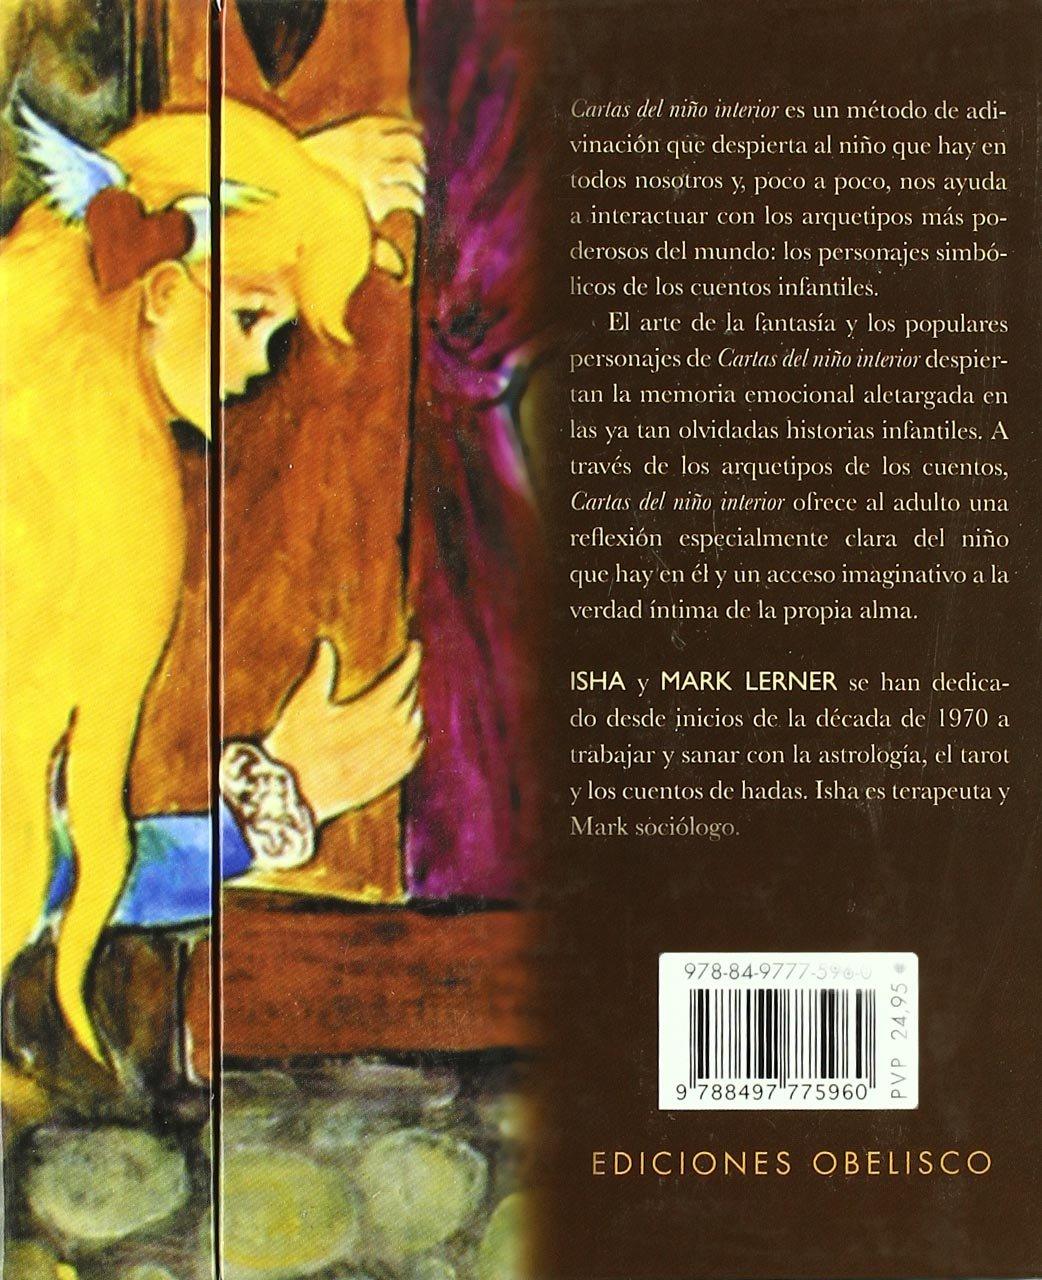 Cartas del nino interior (Spanish Edition): Isha Lerner ...